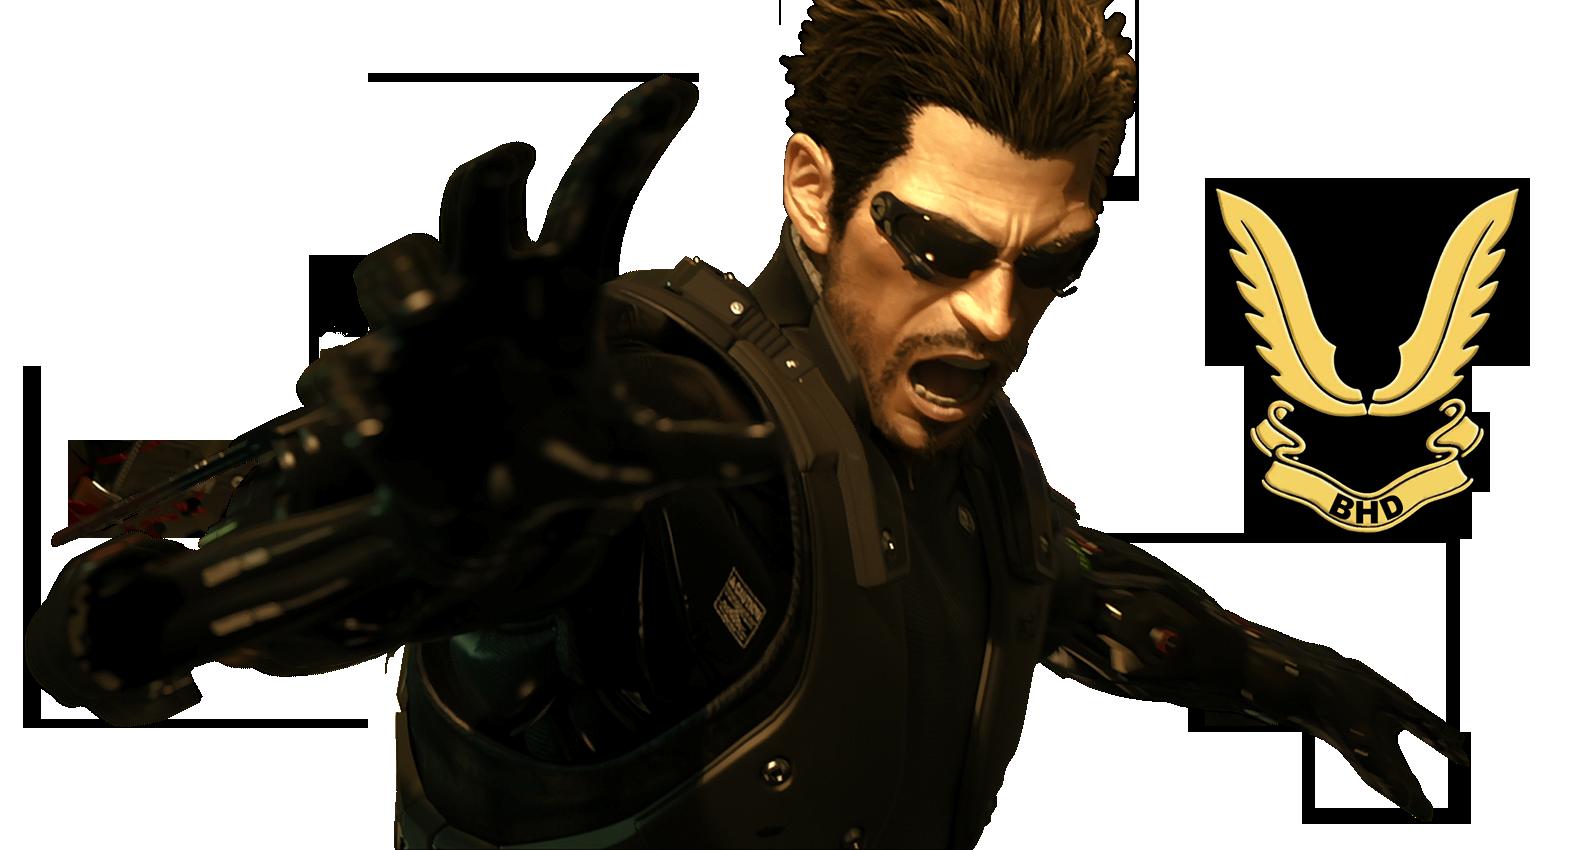 Deus Ex Png Pic PNG Image - Deus Ex PNG